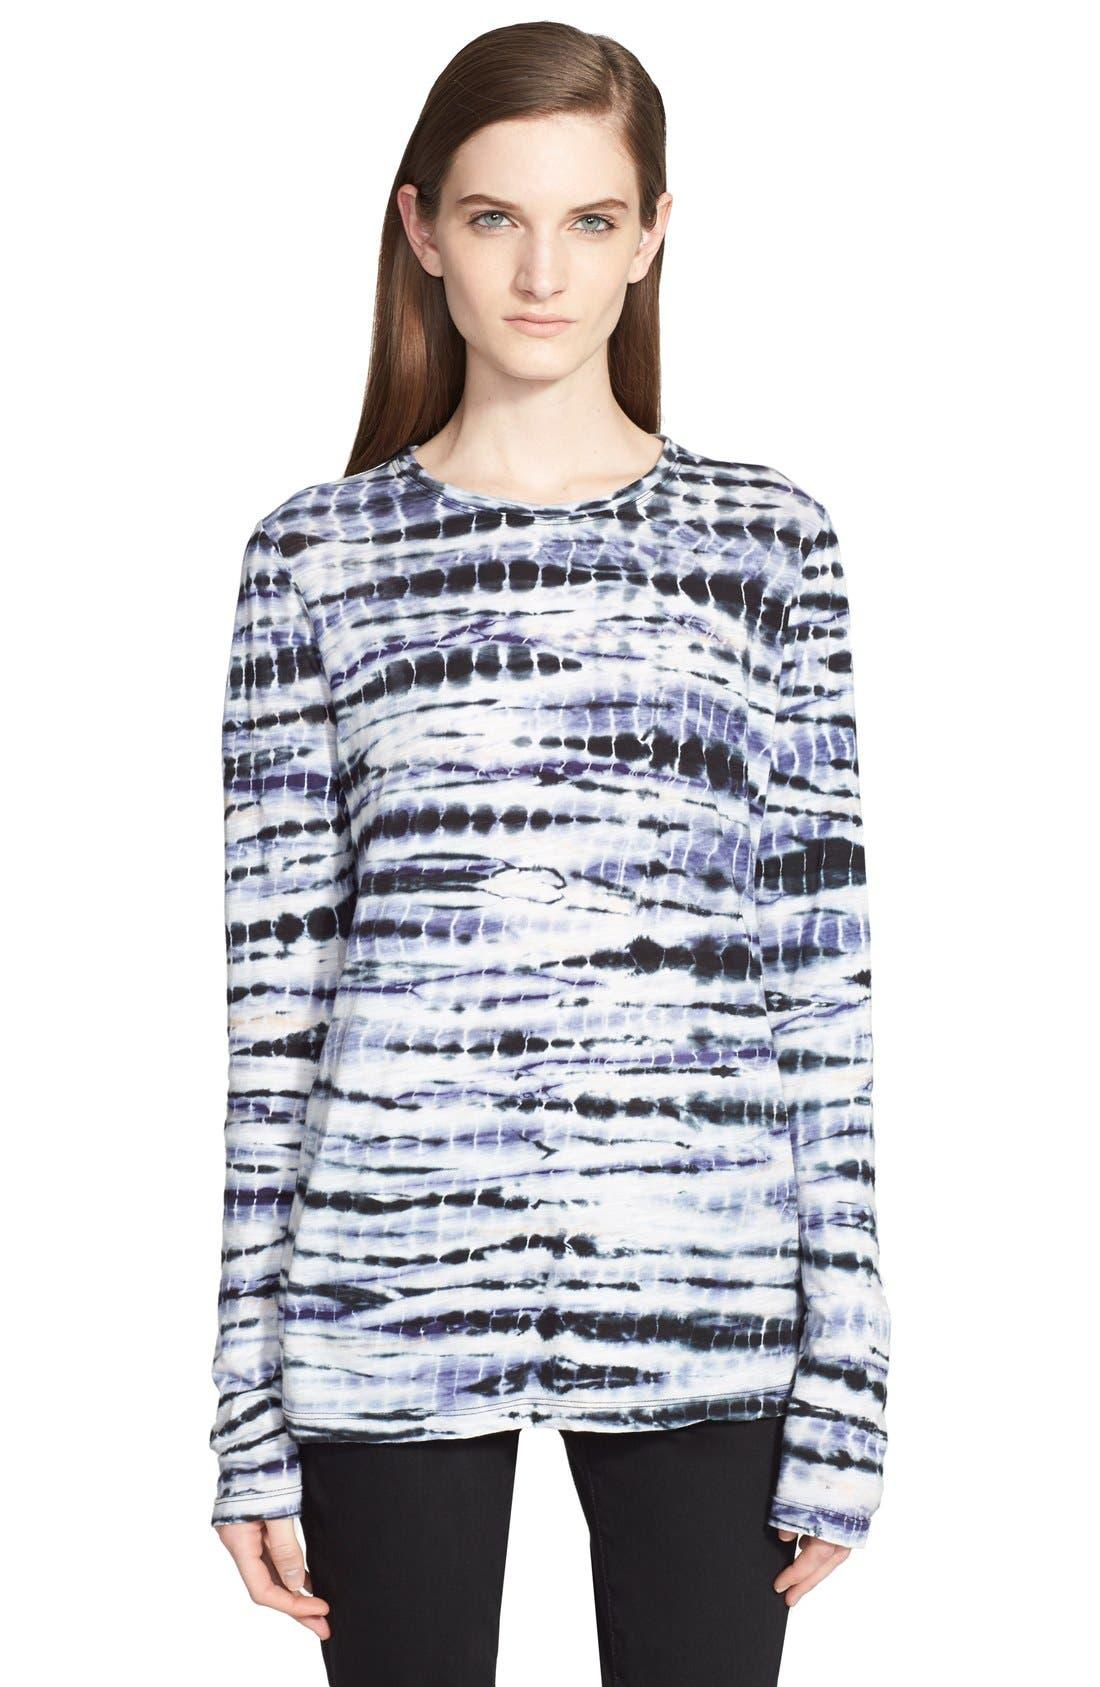 Alternate Image 1 Selected - Proenza Schouler Tie Dye Tissue Jersey Long Sleeve Tee